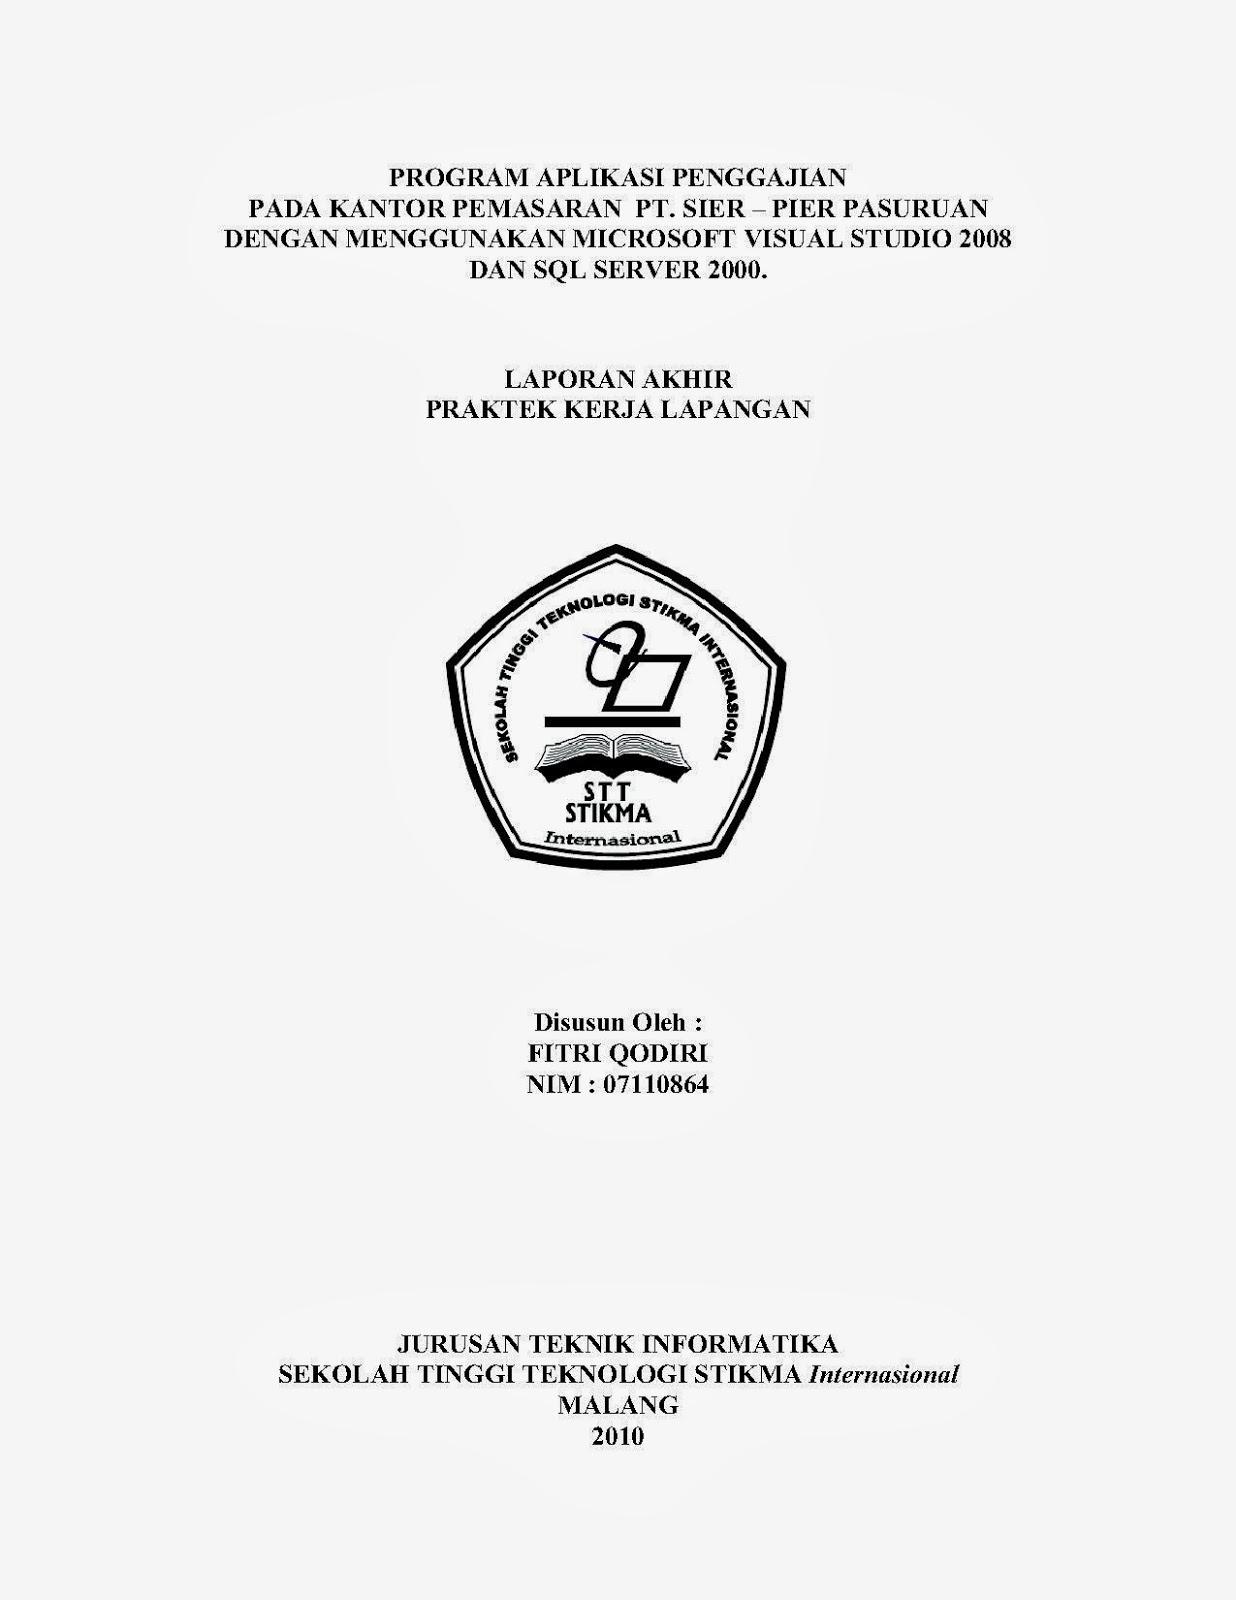 Contoh Judul Skripsi Pendidikan Pkn Kumpulan Judul Skripsi Teknik Elektro << Contoh Skripsi 2015 Kumpulan Makalah Cara Membuat Makalah Contoh Makalah Contoh